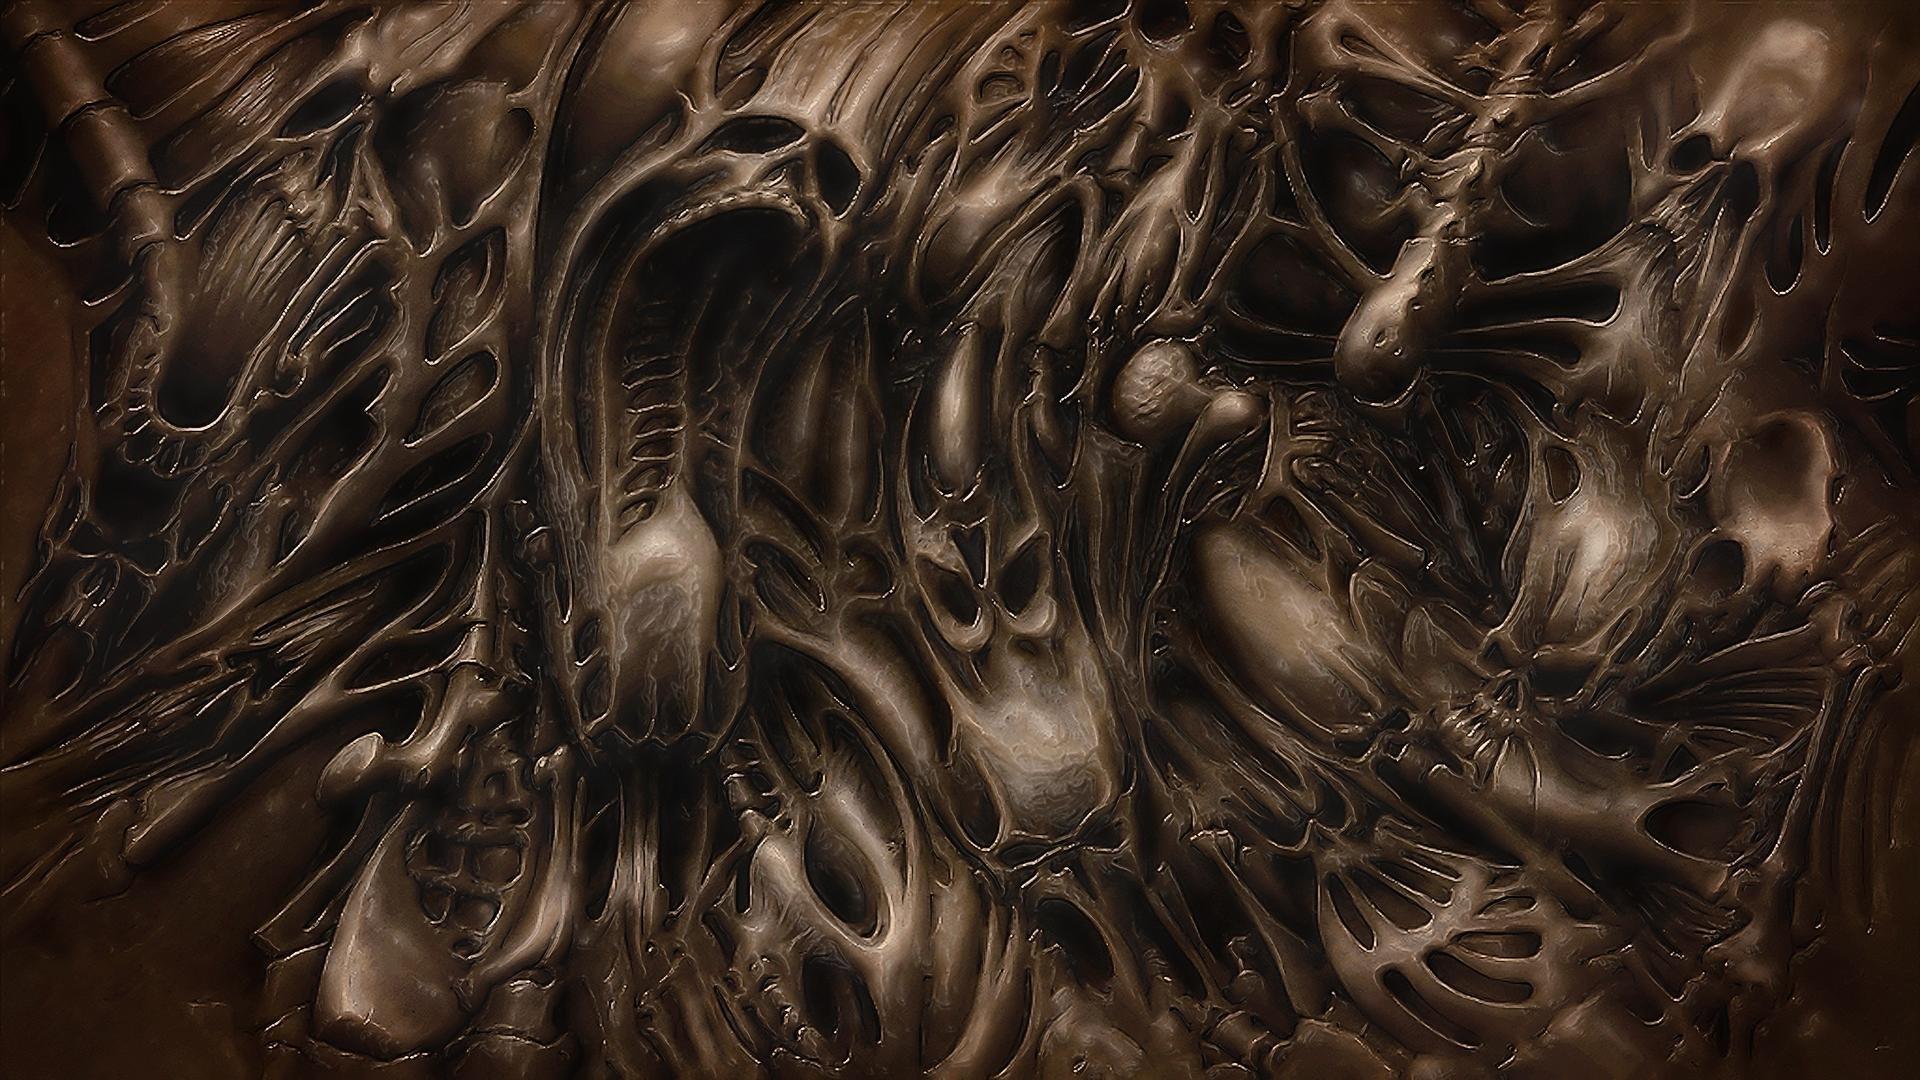 Wallpaper : 1920x1080 px, 1doom, action, artwork, creature, dark